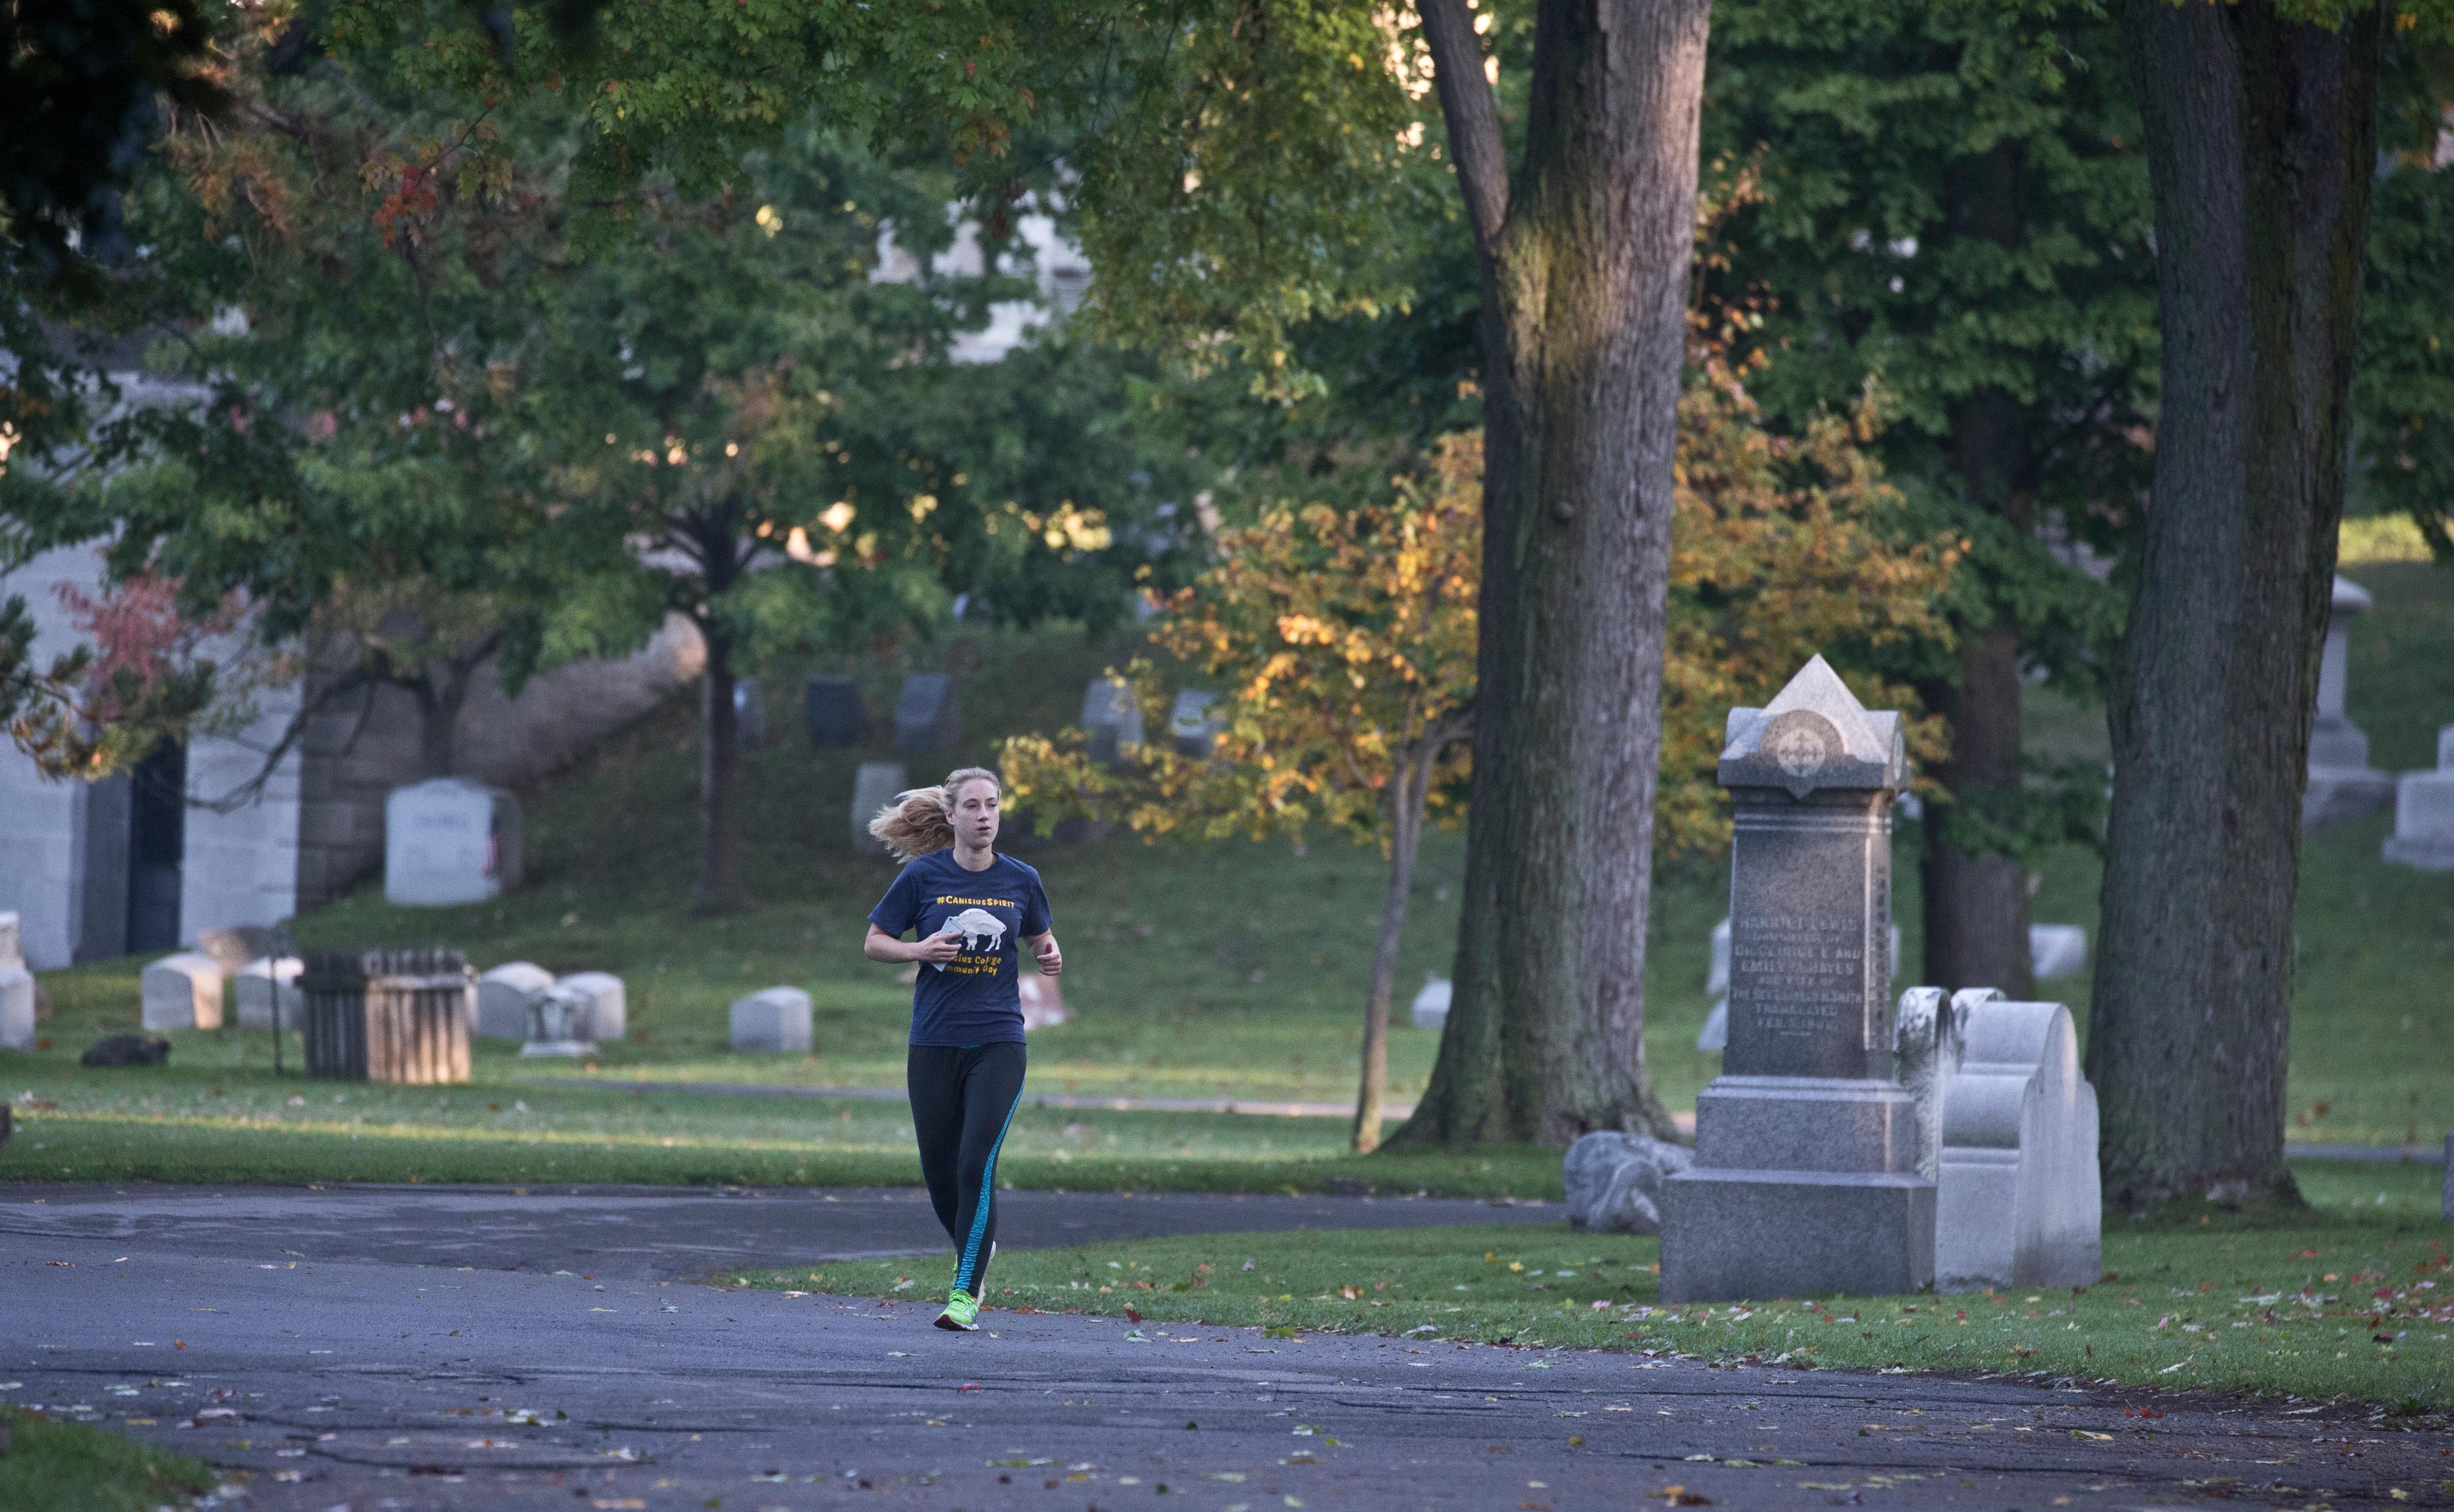 Rebekah Gordon from Horseheads, N.Y., runs through Forest Lawn Cemetery. (John Hickey/Buffalo News)